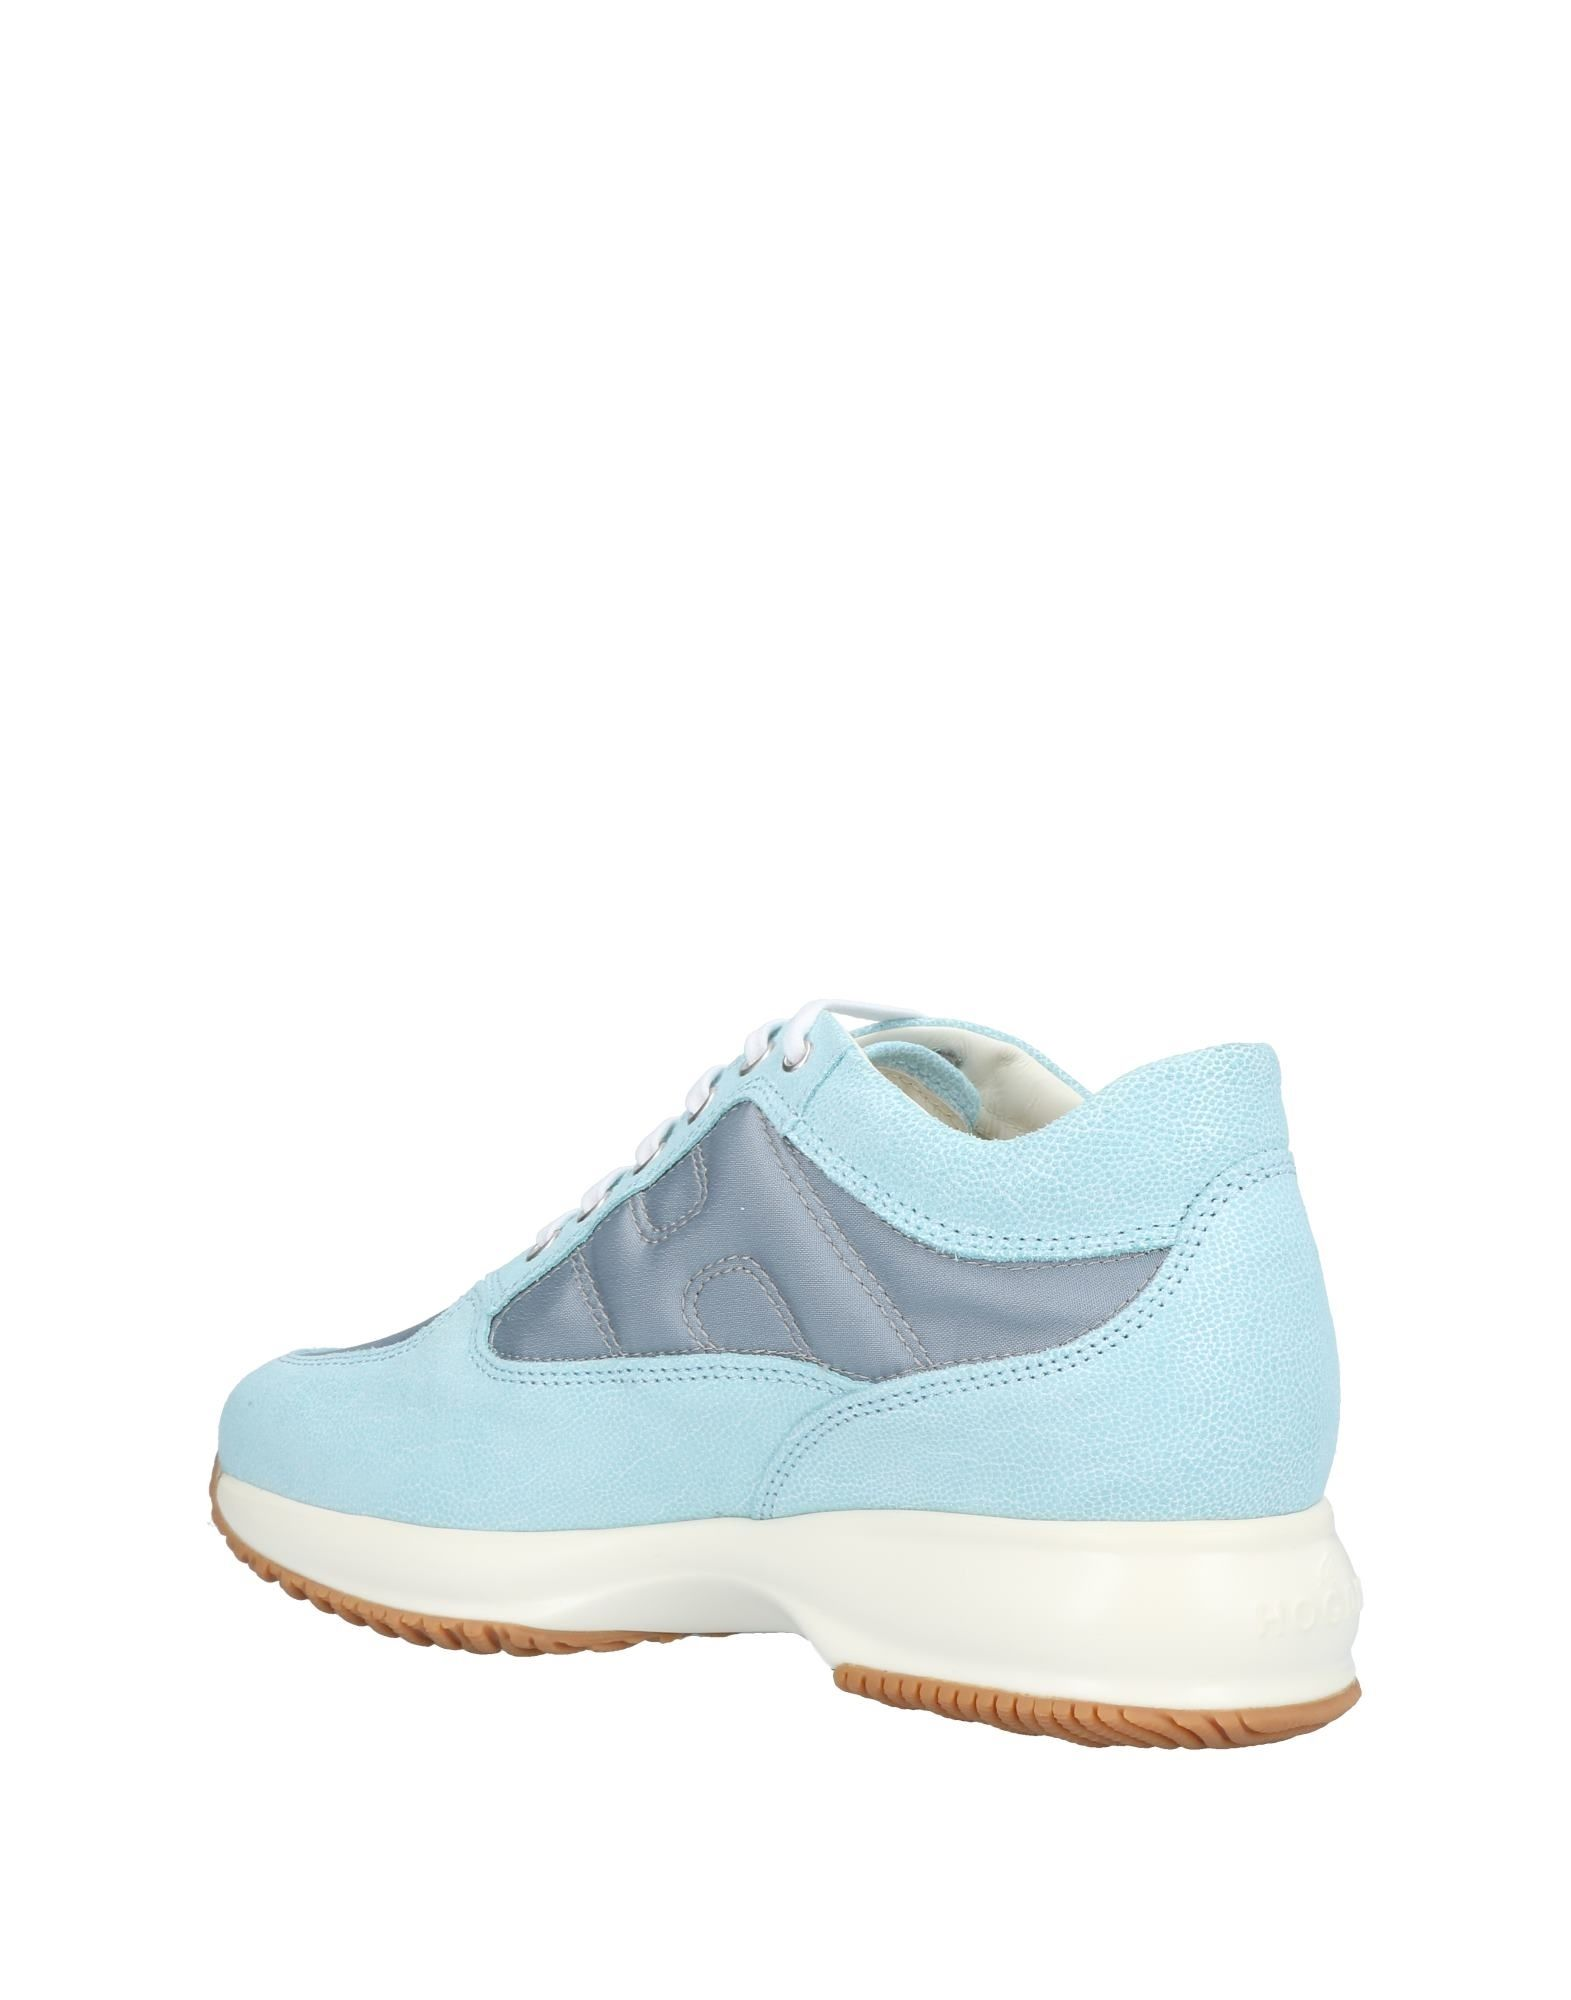 Hogan Sneakers  Damen  Sneakers 11412651NP Heiße Schuhe 2fabf0